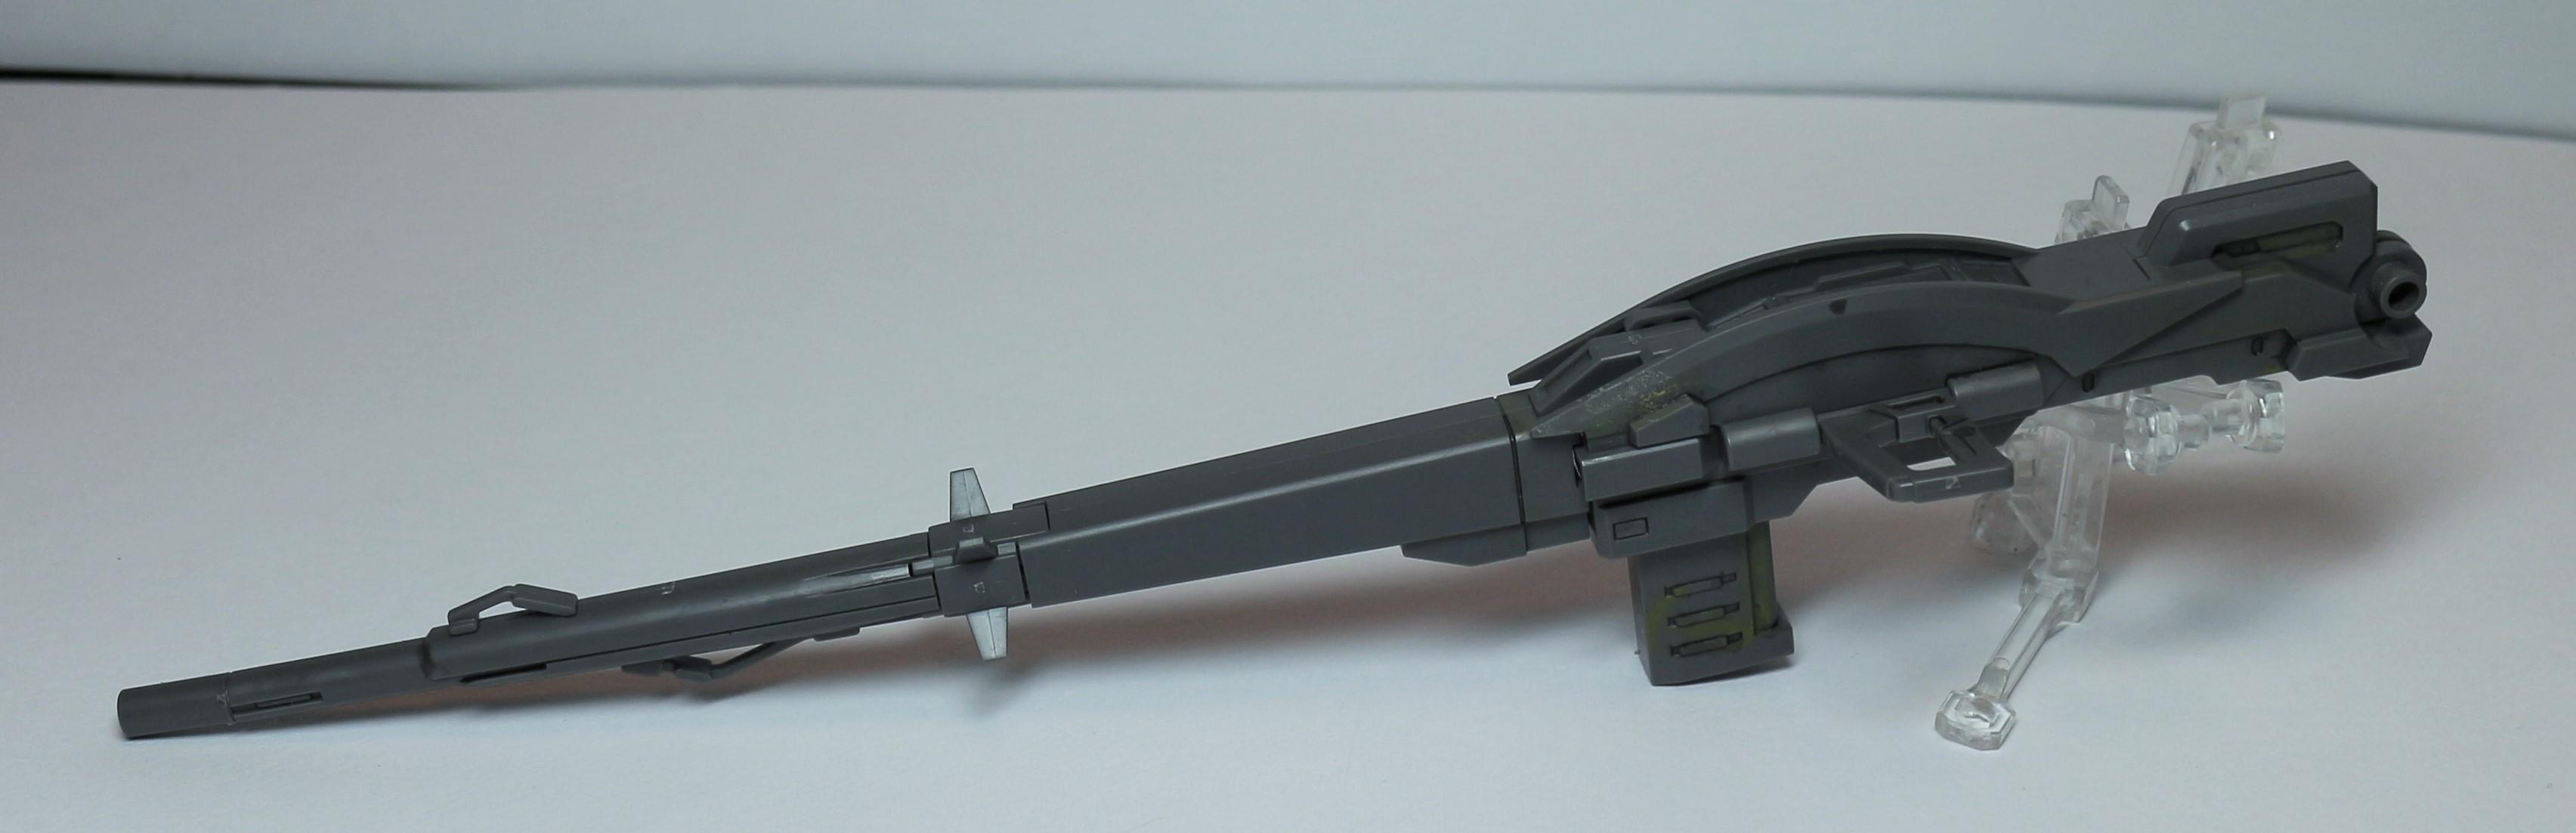 MG-CrossBone_X2_Custom-151.jpg